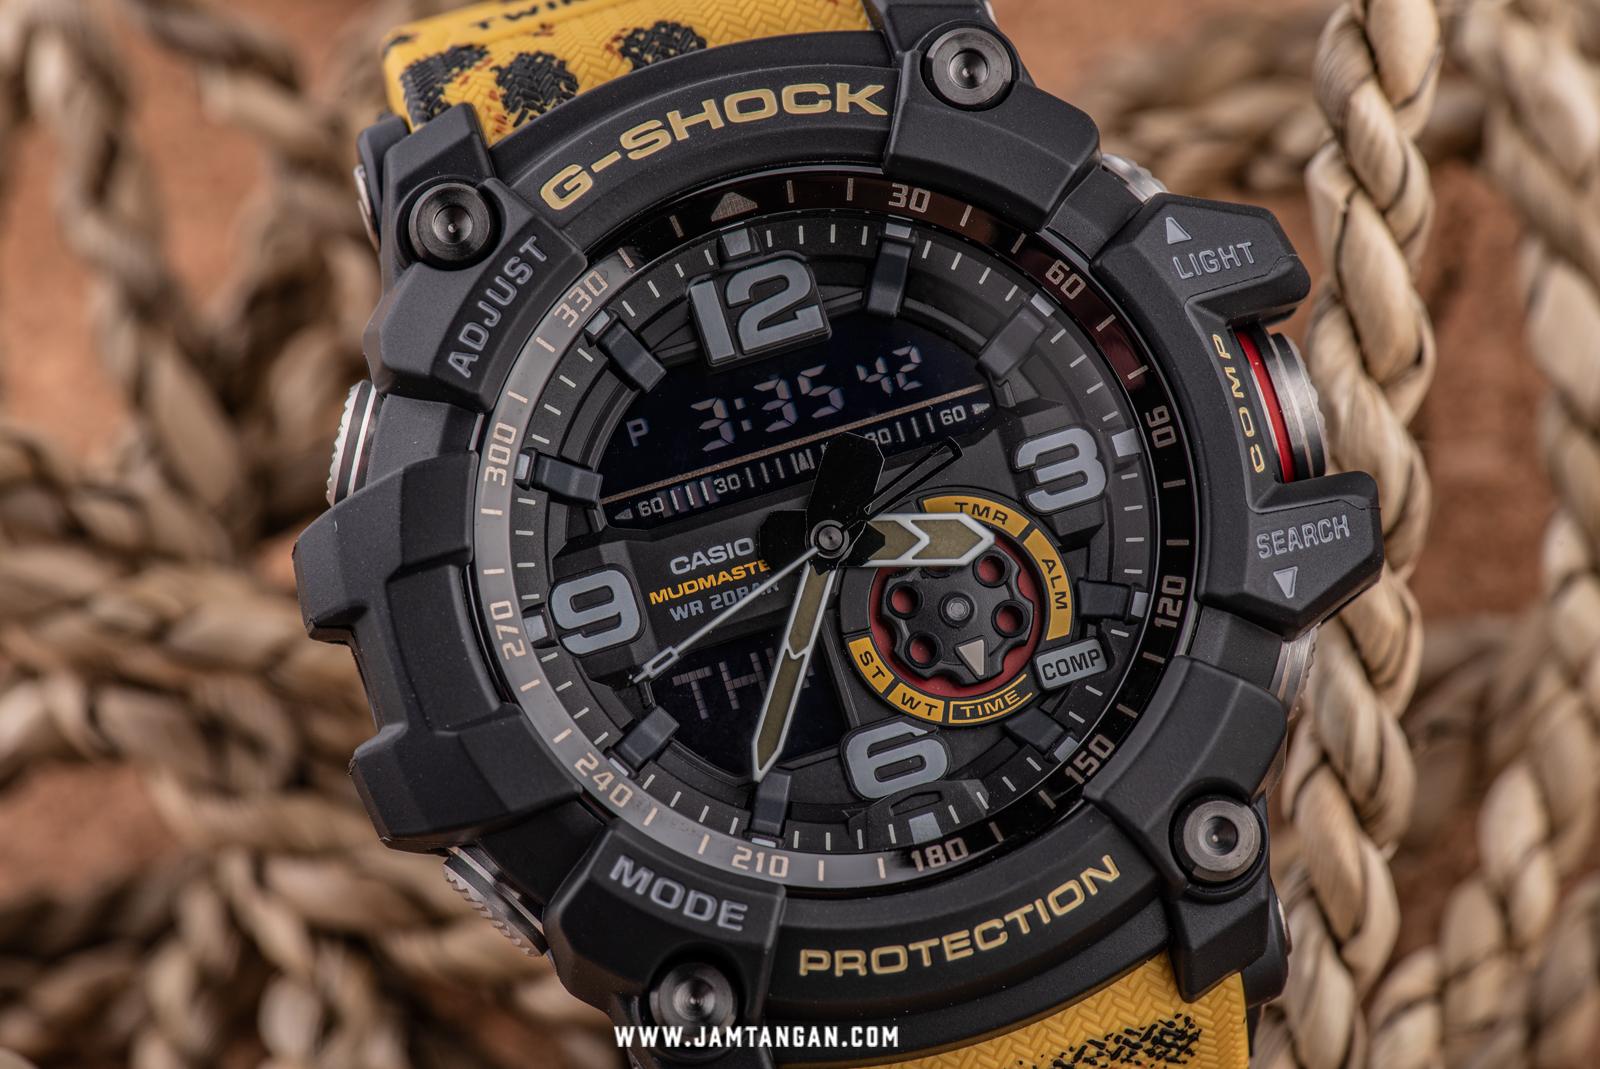 Casio G-Shock GG-1000WLP-1AJR Mudmaster Twin Sensor Digital Analog Dial Camouflage Resin Strap Machtwatch